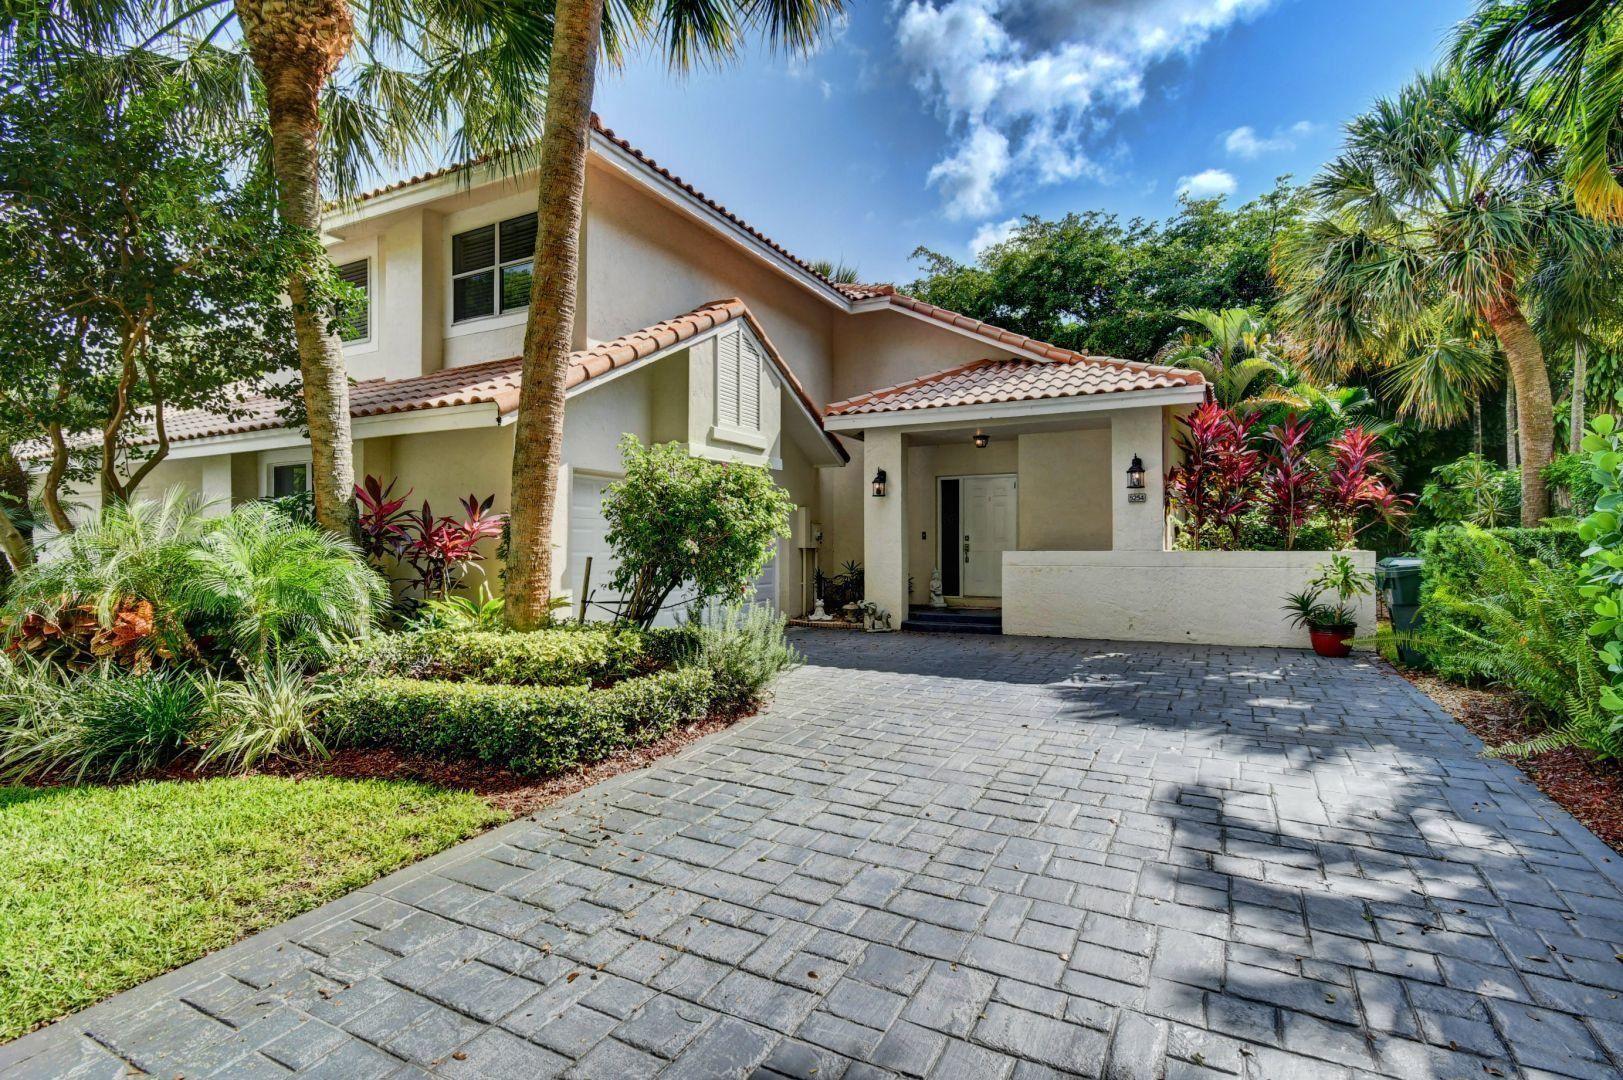 5254 NW 22nd Avenue, Boca Raton, FL 33496 - #: RX-10680242